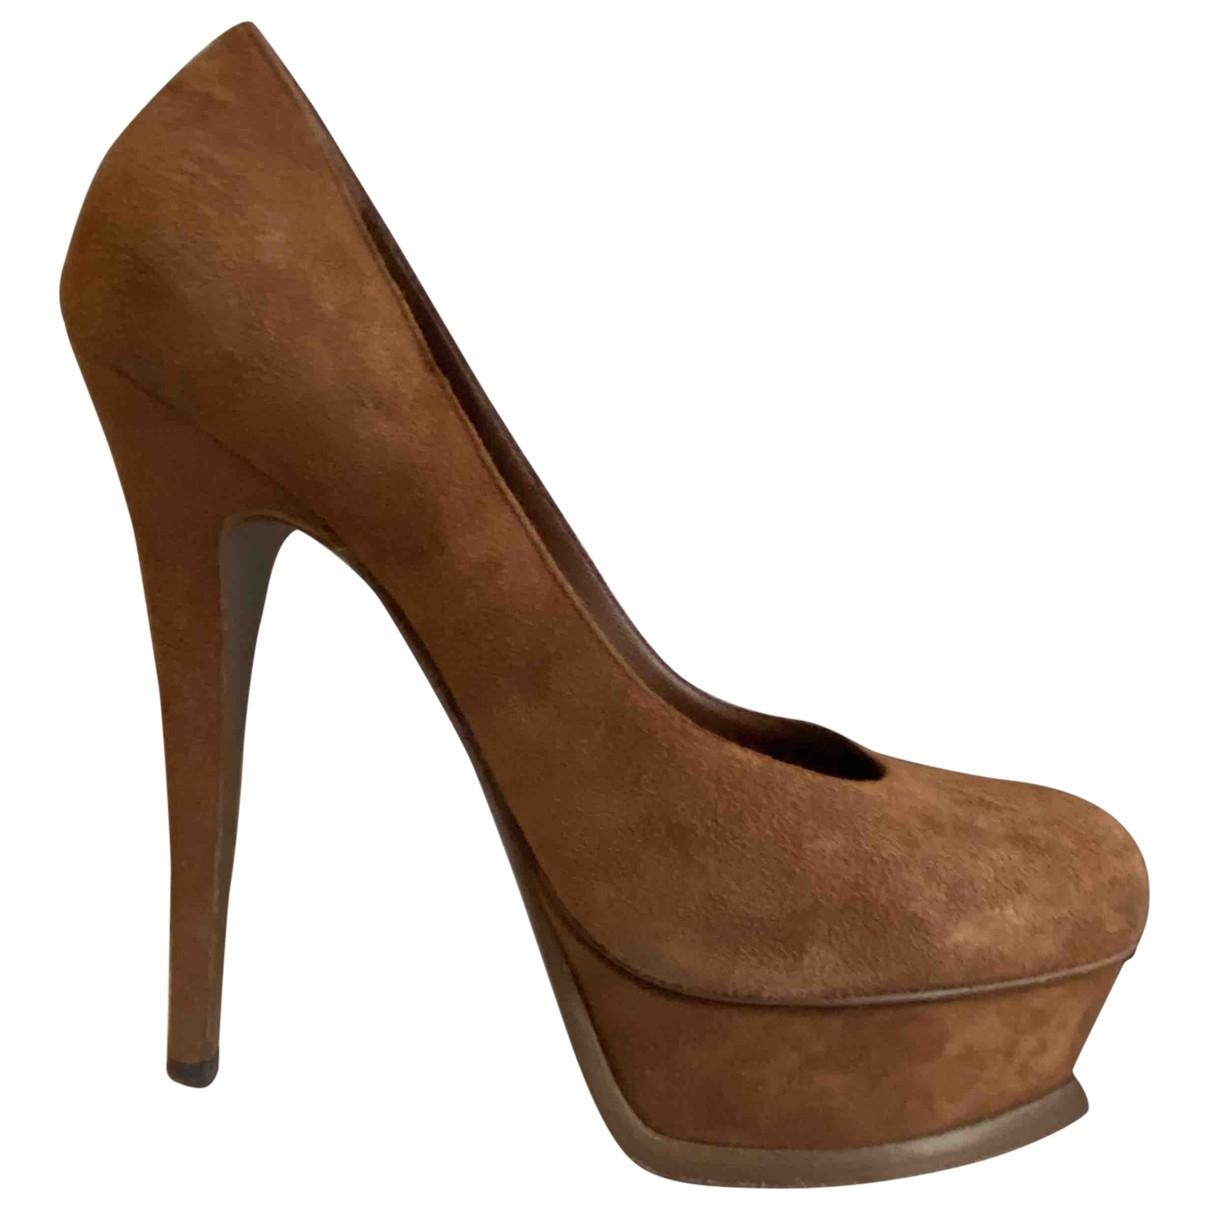 Yves Saint Laurent Trib Too Brown Suede Heels for Women 36.5 EU